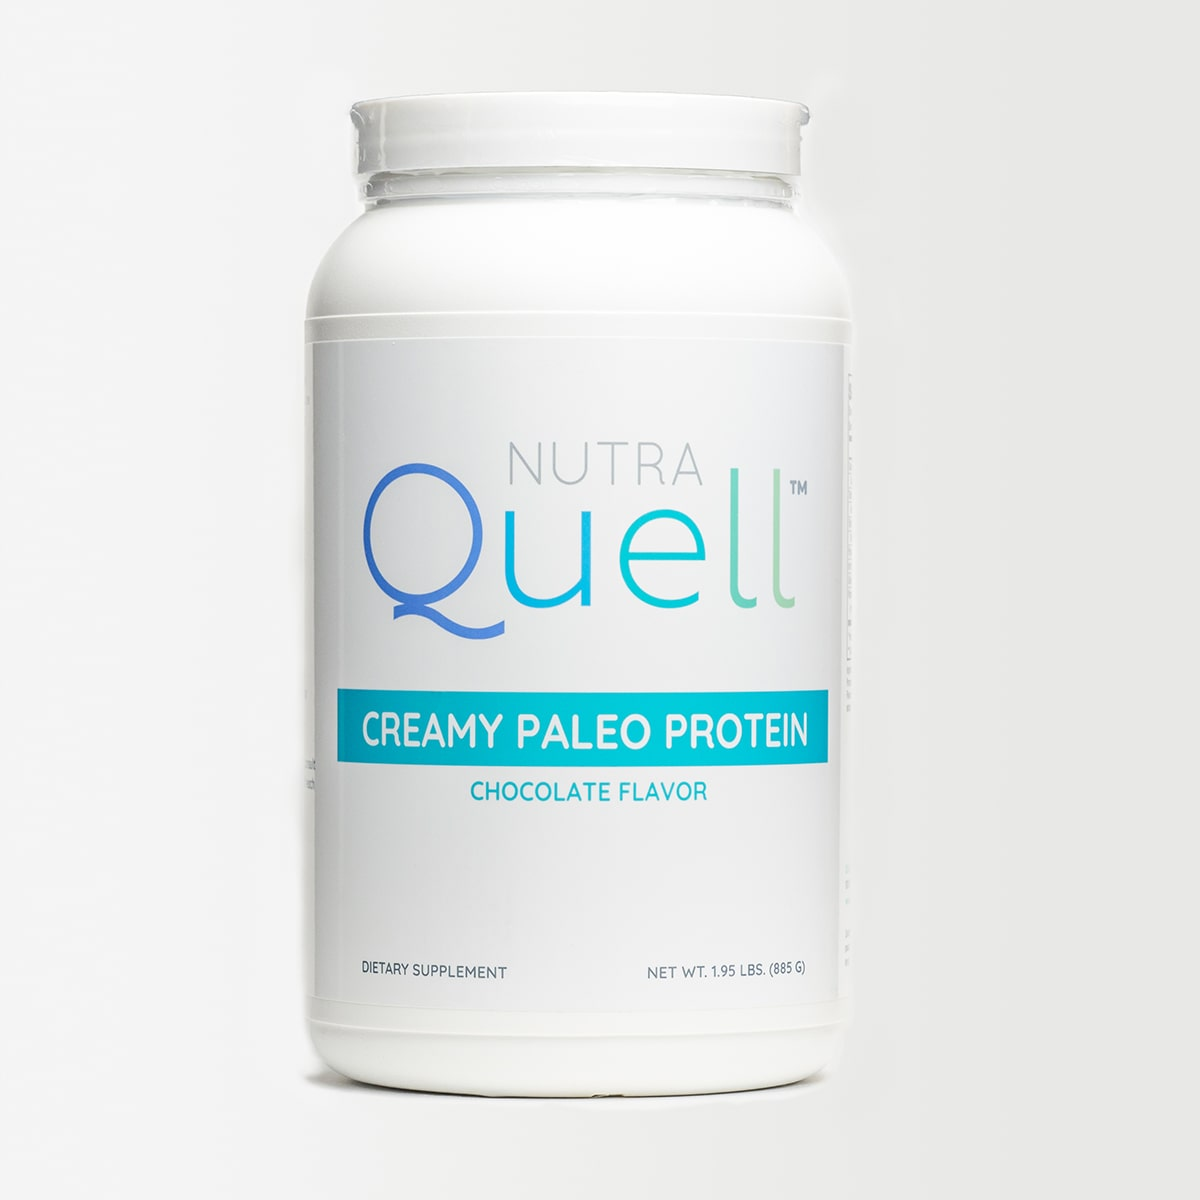 Creamy Paleo Protein (Chocolate)